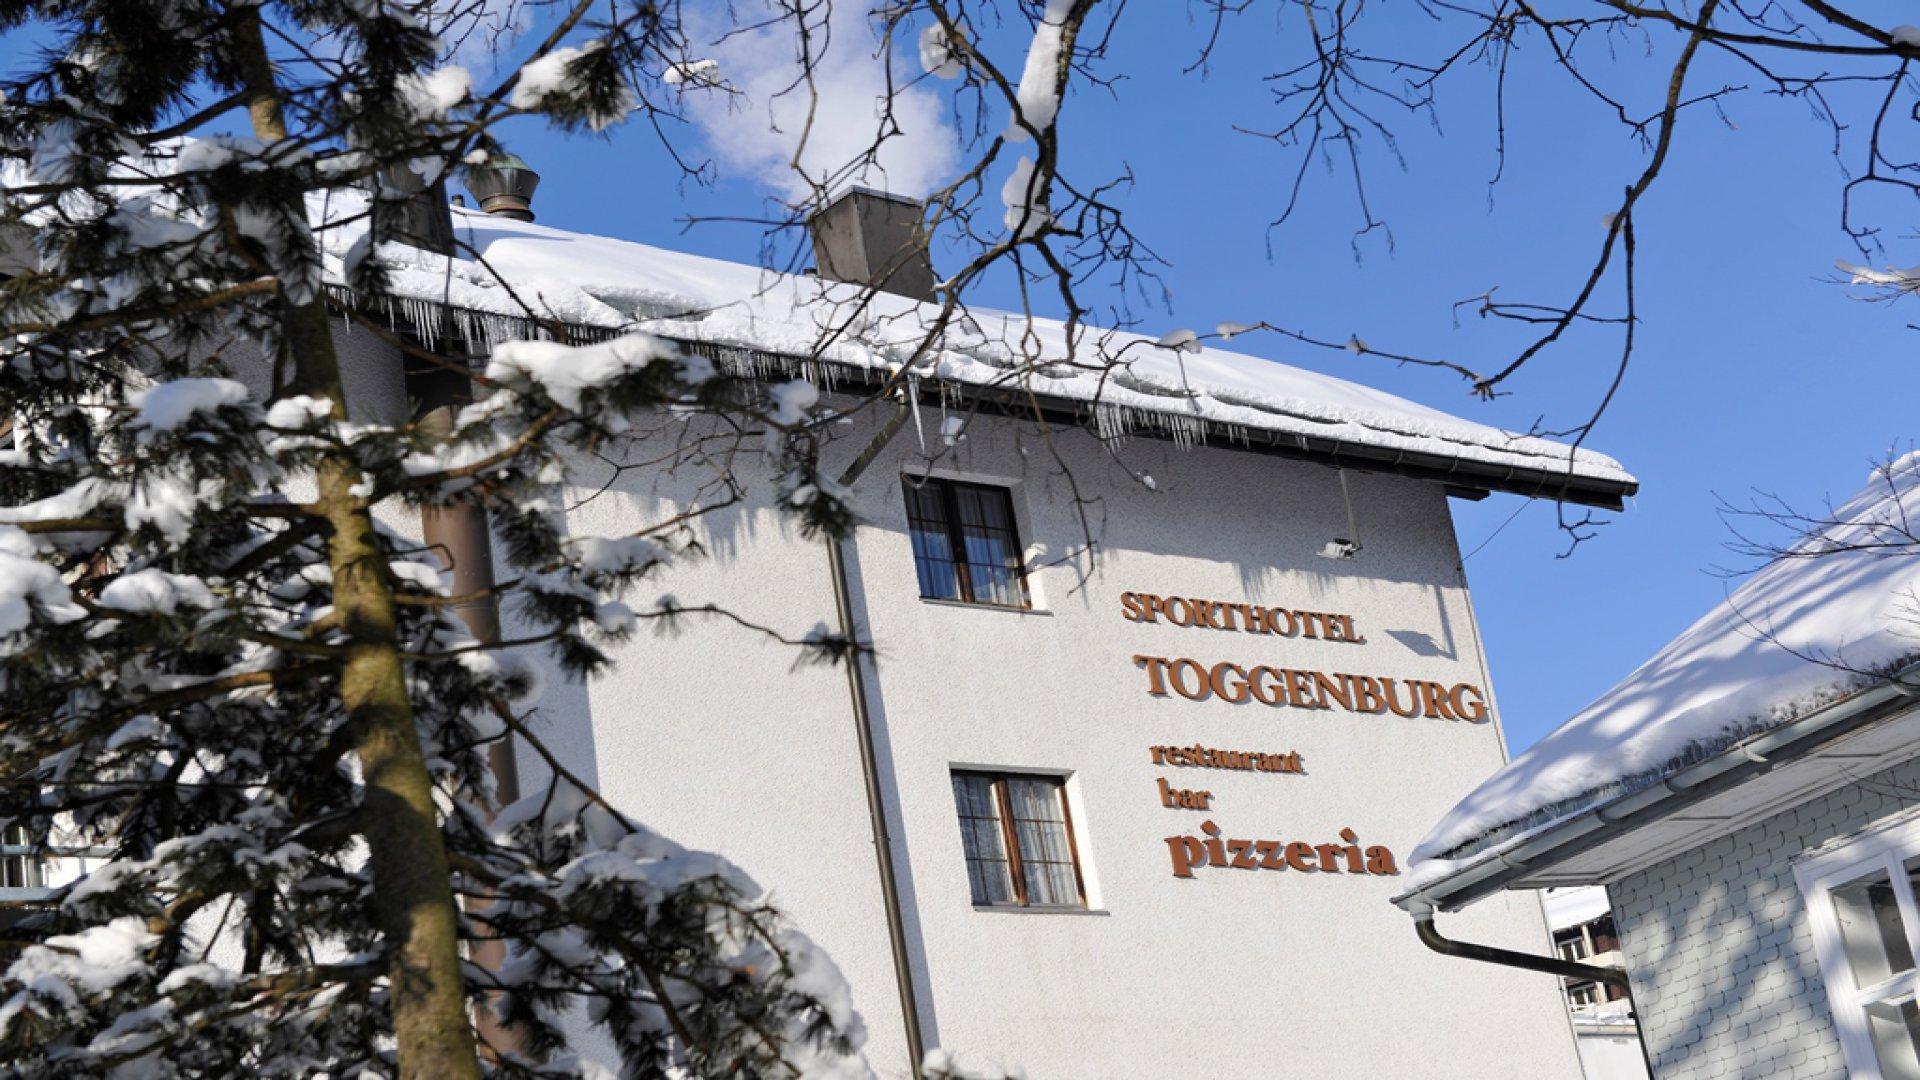 Hotel Toggenburg 2